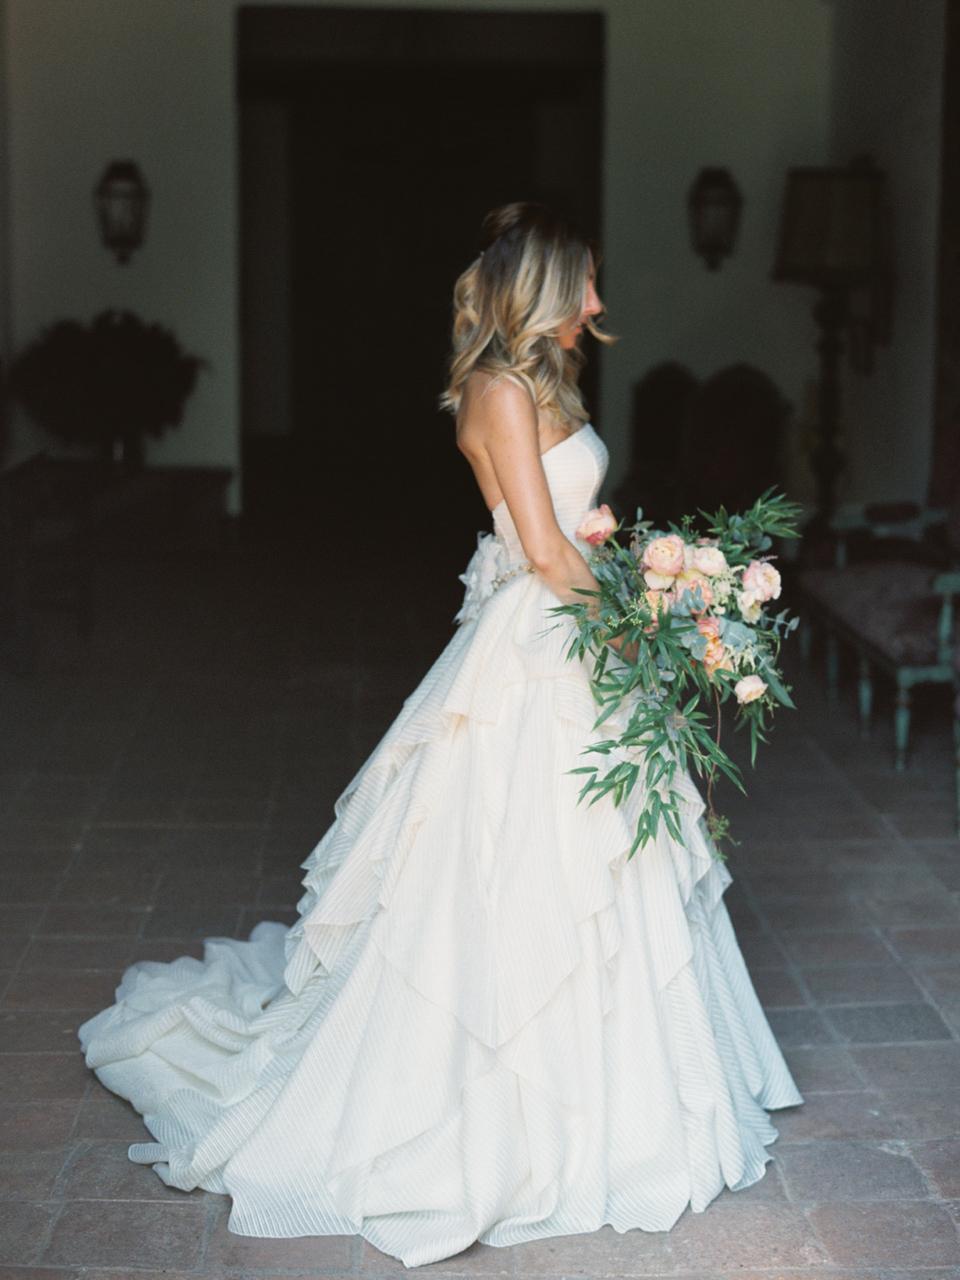 fashion-blogger-wedding-Monica-Sors (1)